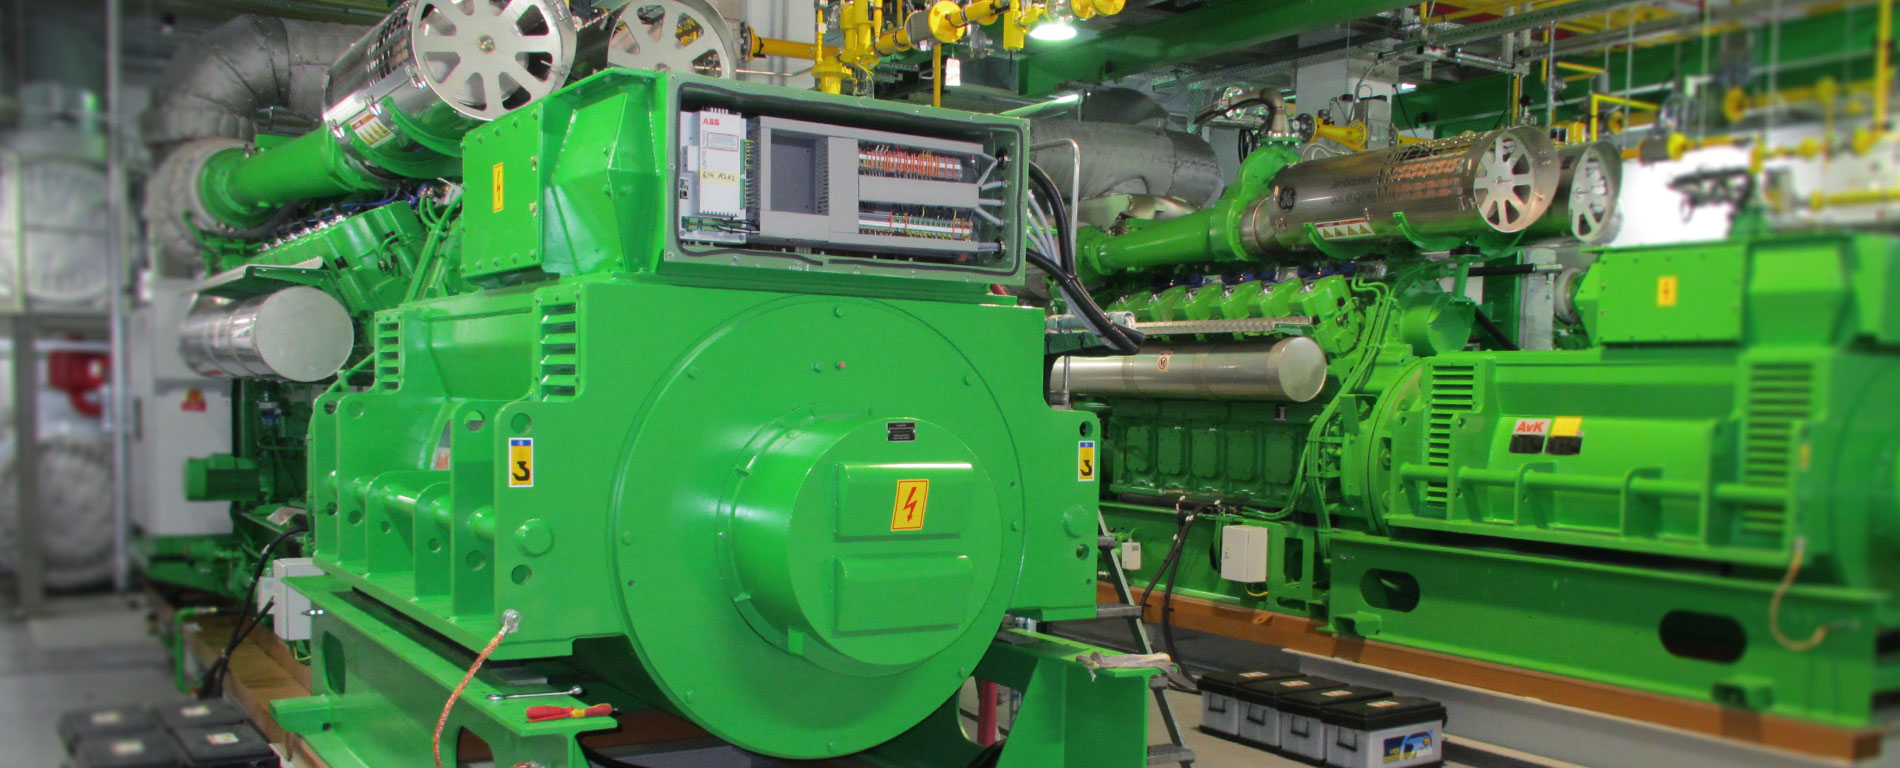 Zwei grüne Elektromotoren in Betrieb